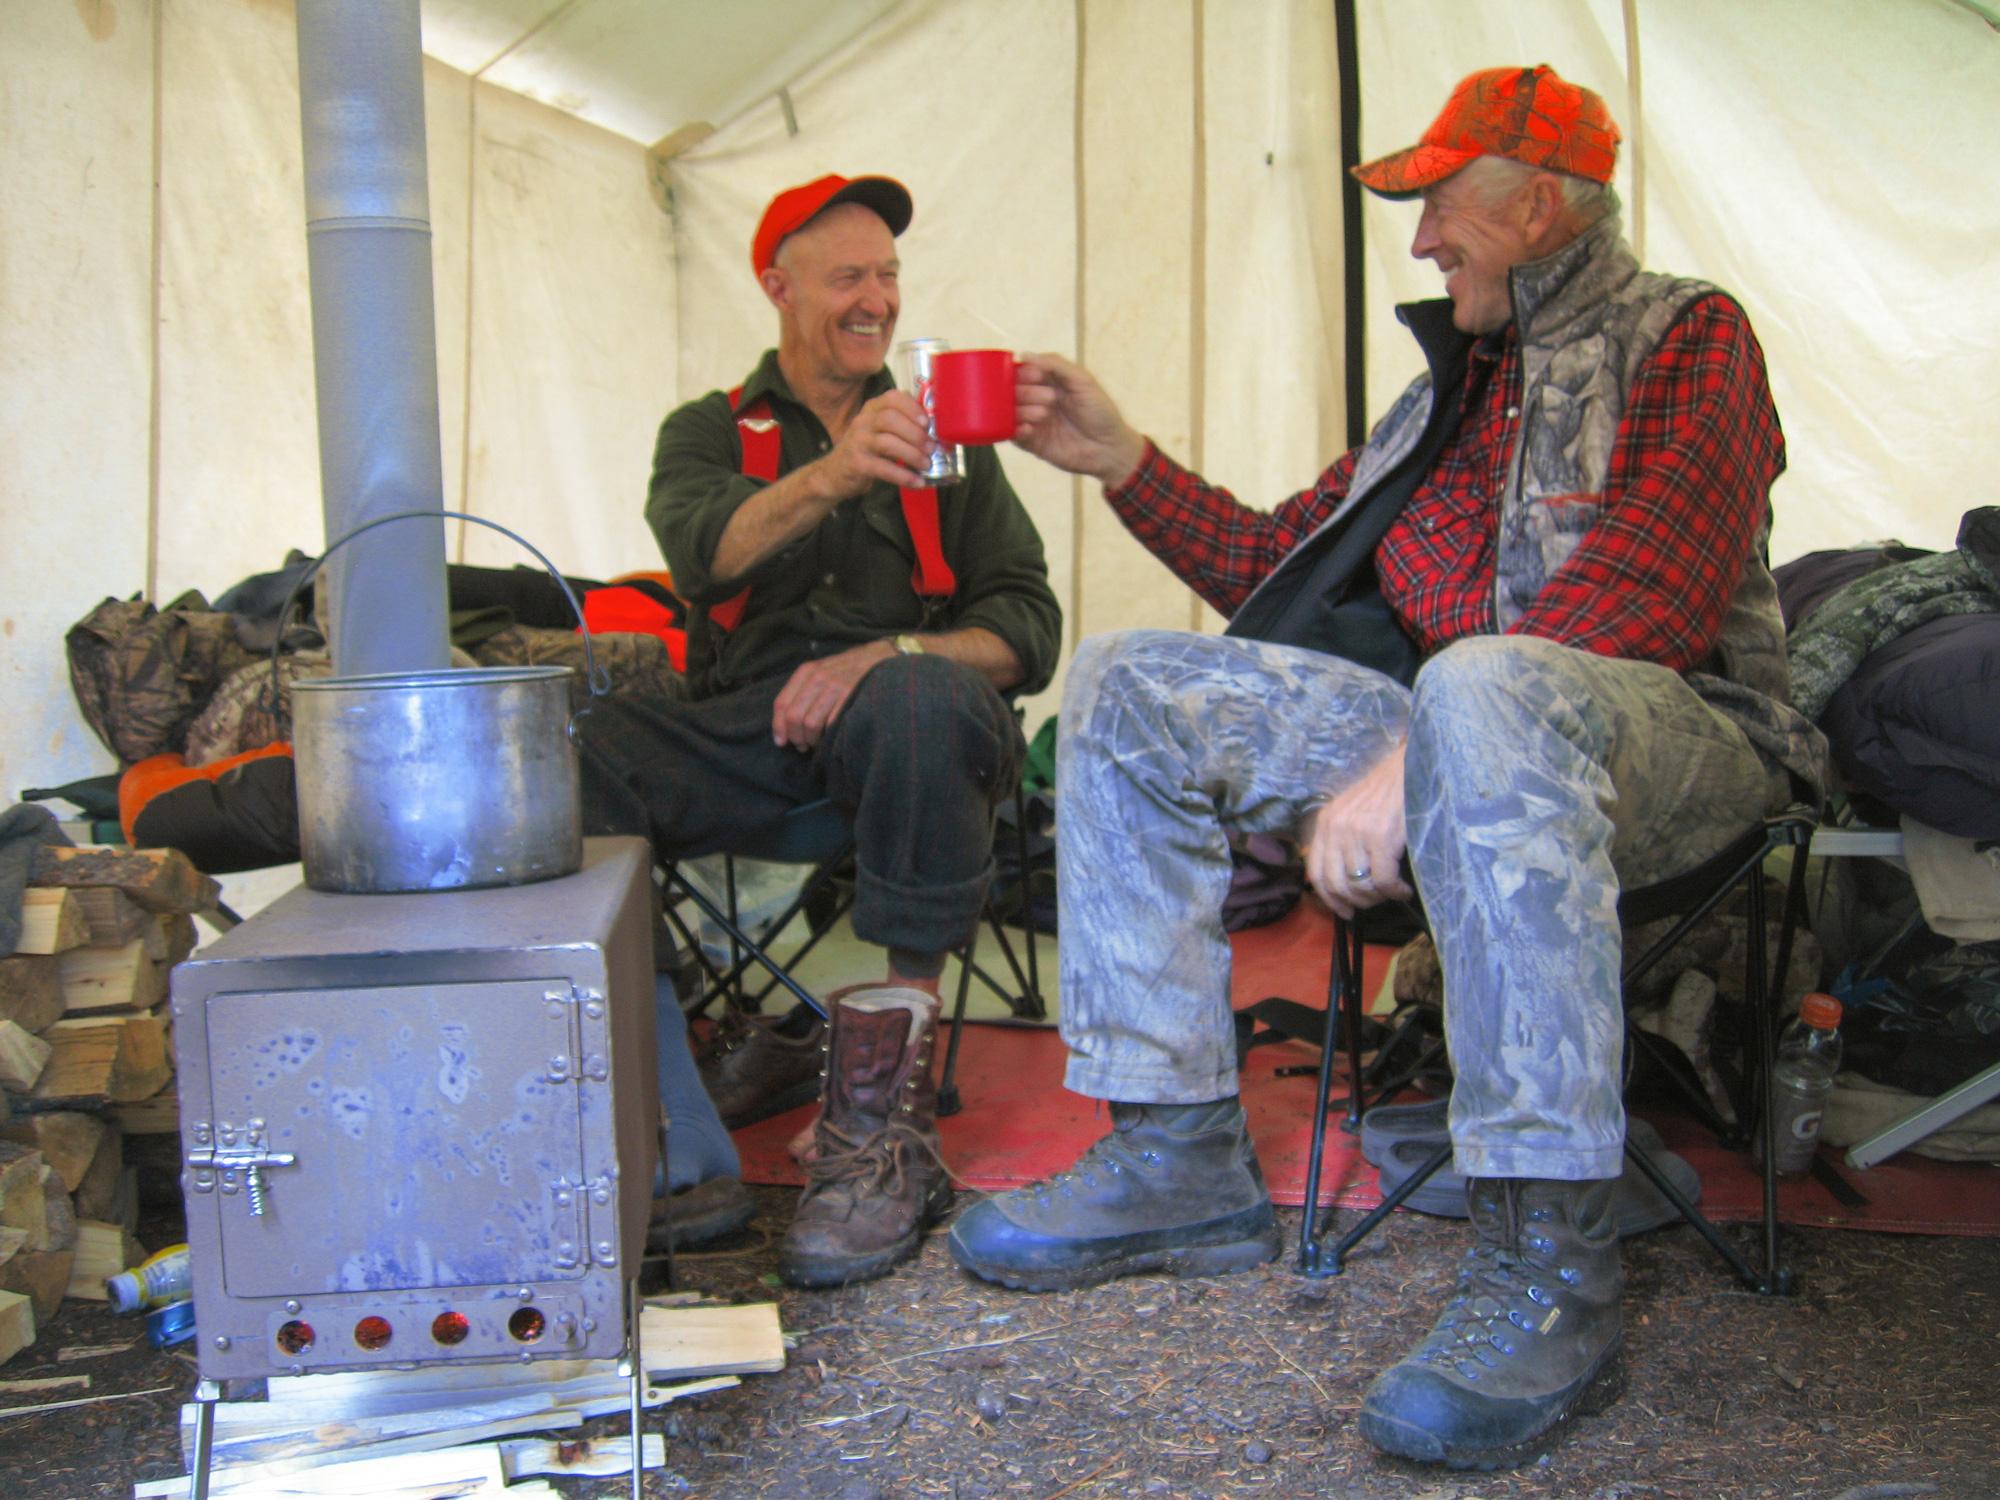 George Bettas and a fellow hunter enjoying coffee around the stove